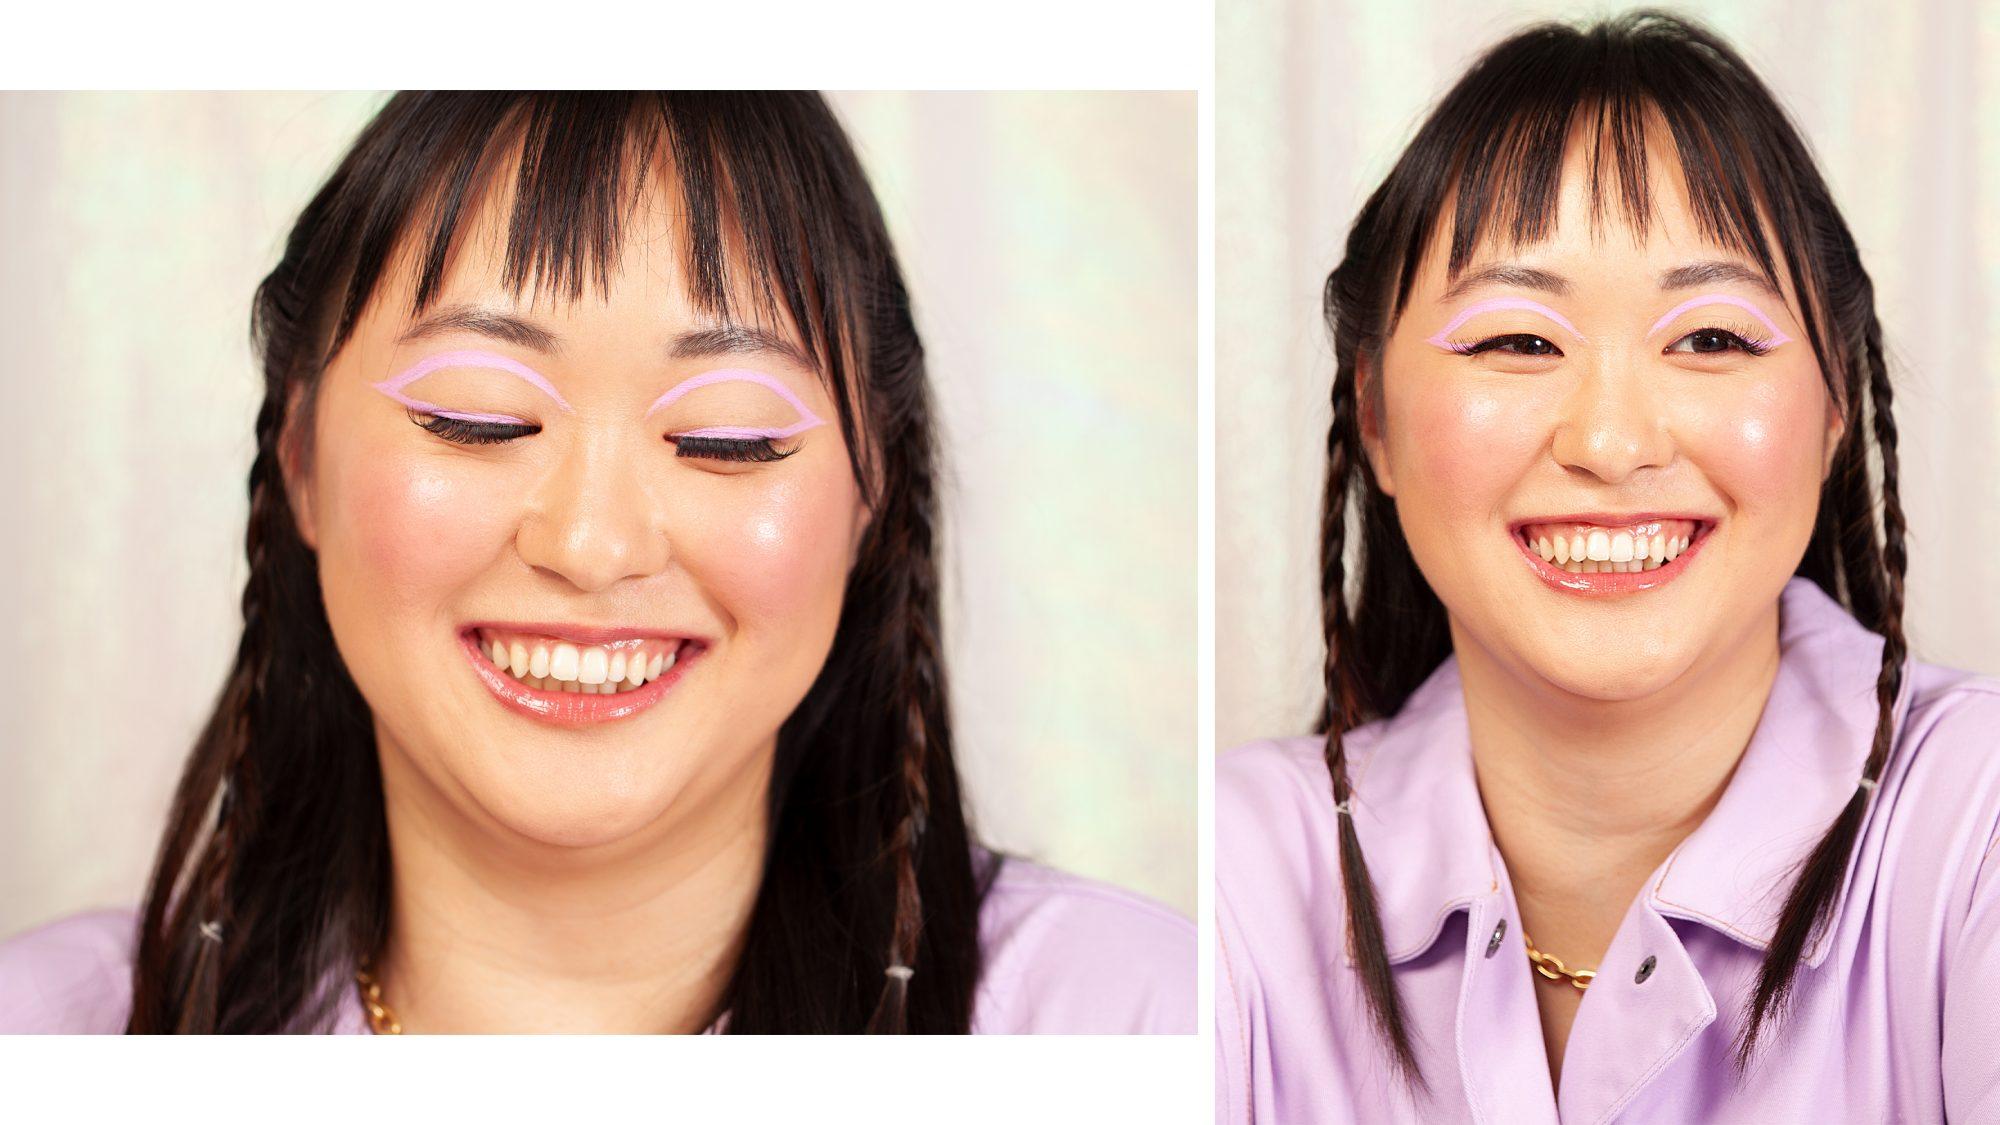 061721-HCF-Lilac-Lines-Bold-Makeup